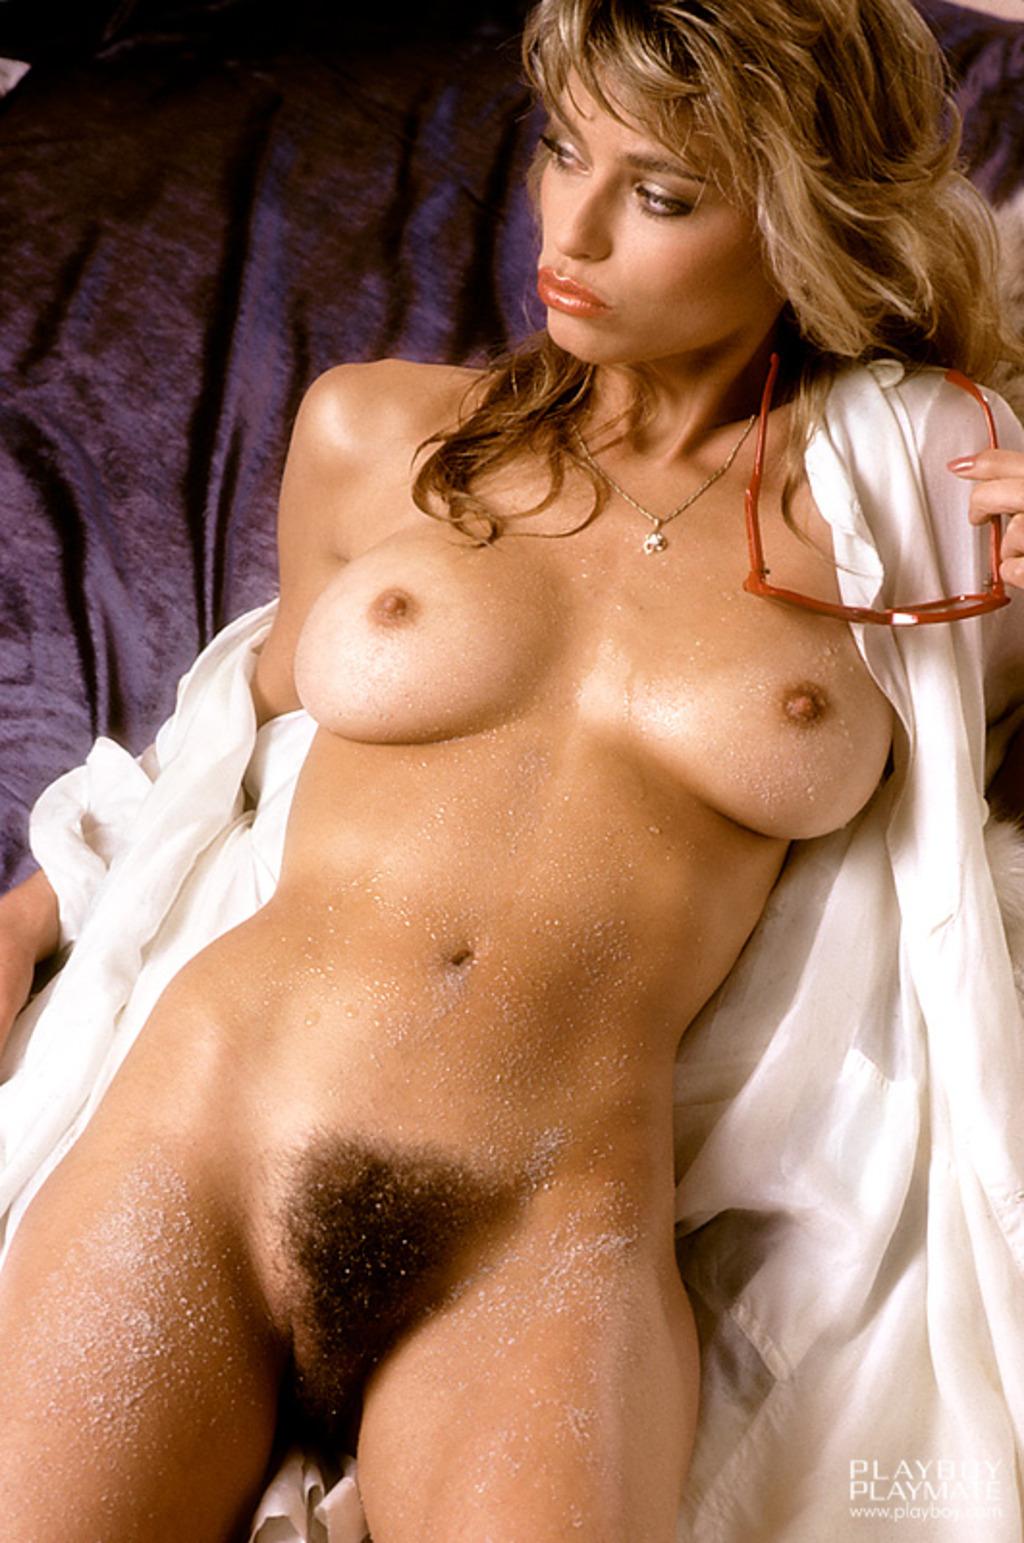 Top ten erotic playboy pussy photos hentai galleries